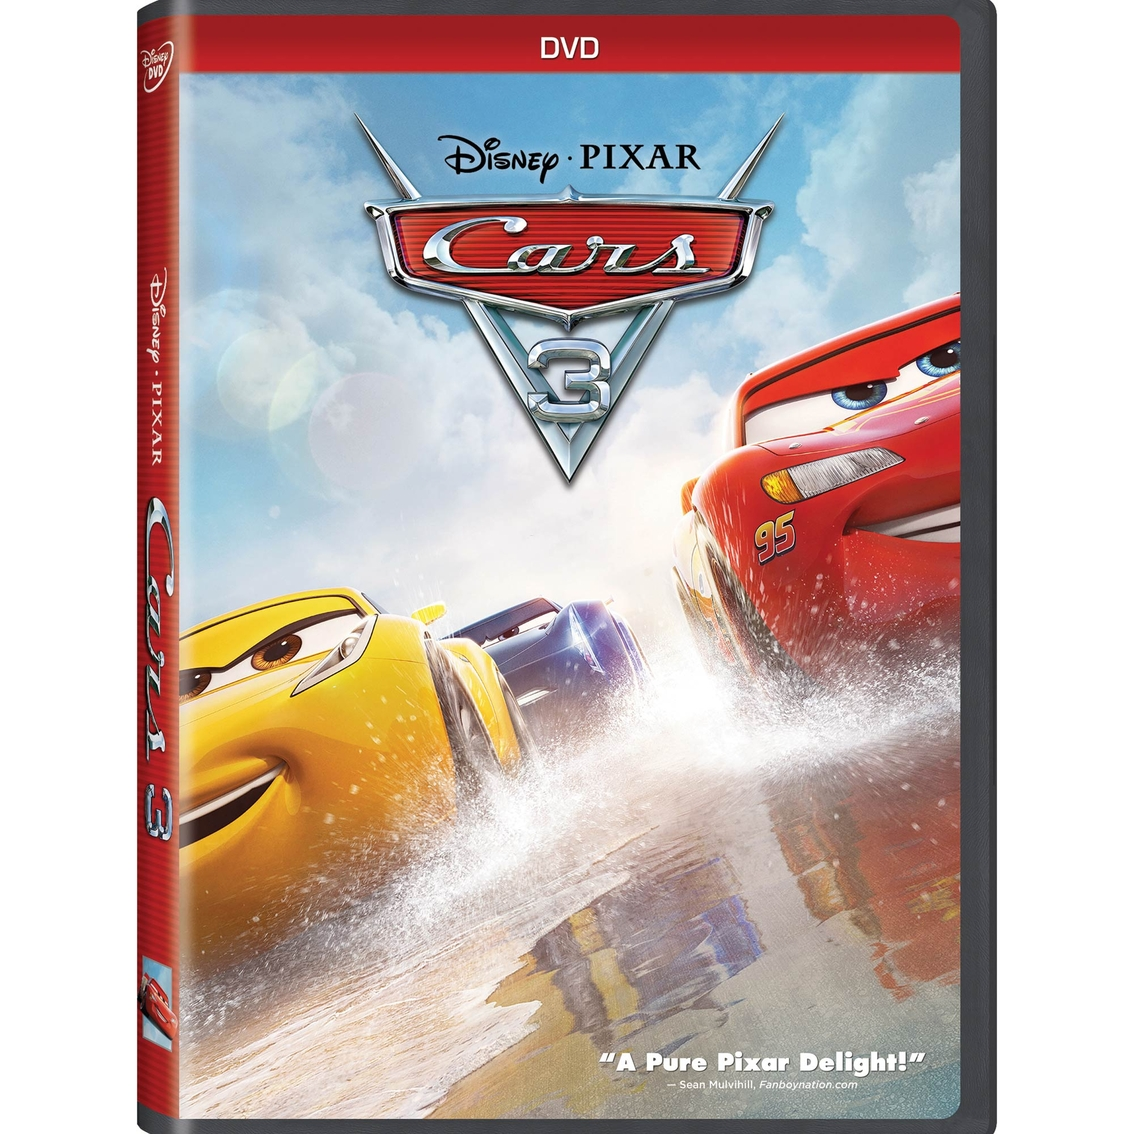 Disney Pixar Cars 3 Dvd Movies Amp Videos Electronics